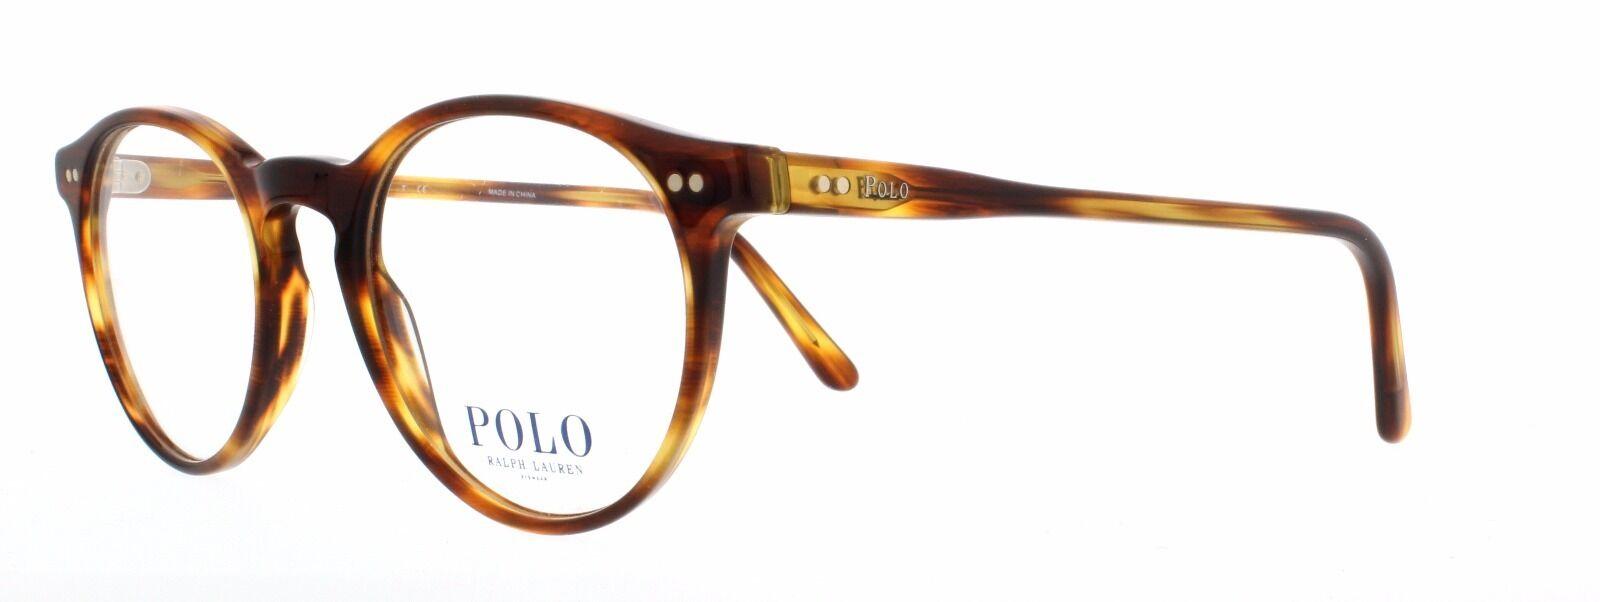 18cc833903 Polo Eyeglasses Ph 2083 5007 Havana Striped 48mm for sale online